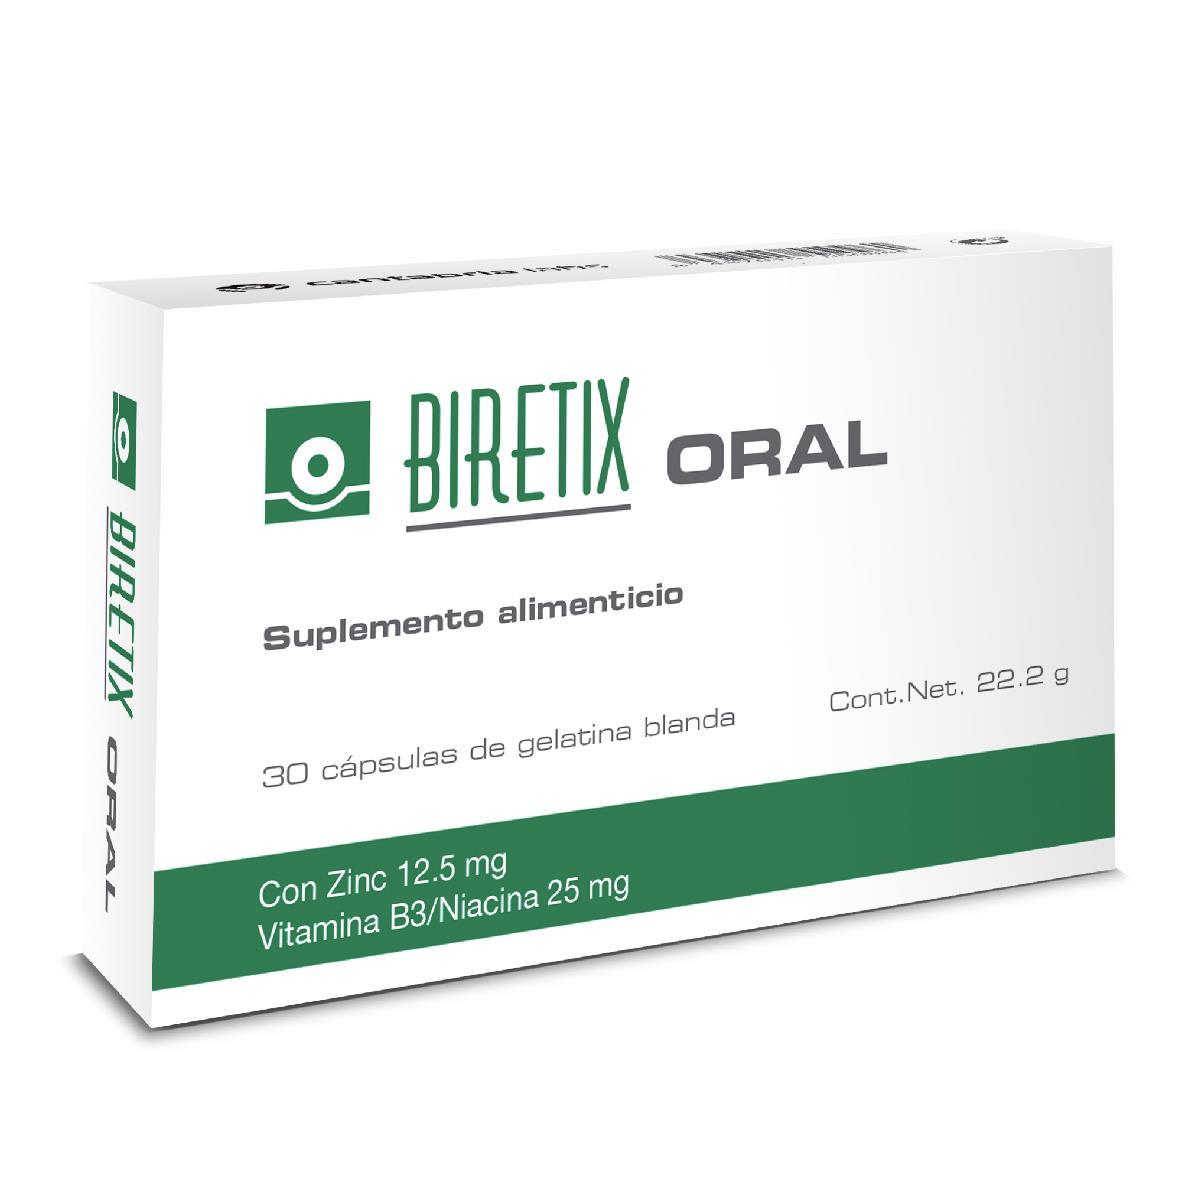 Biretix Oral 30 Cápsulas